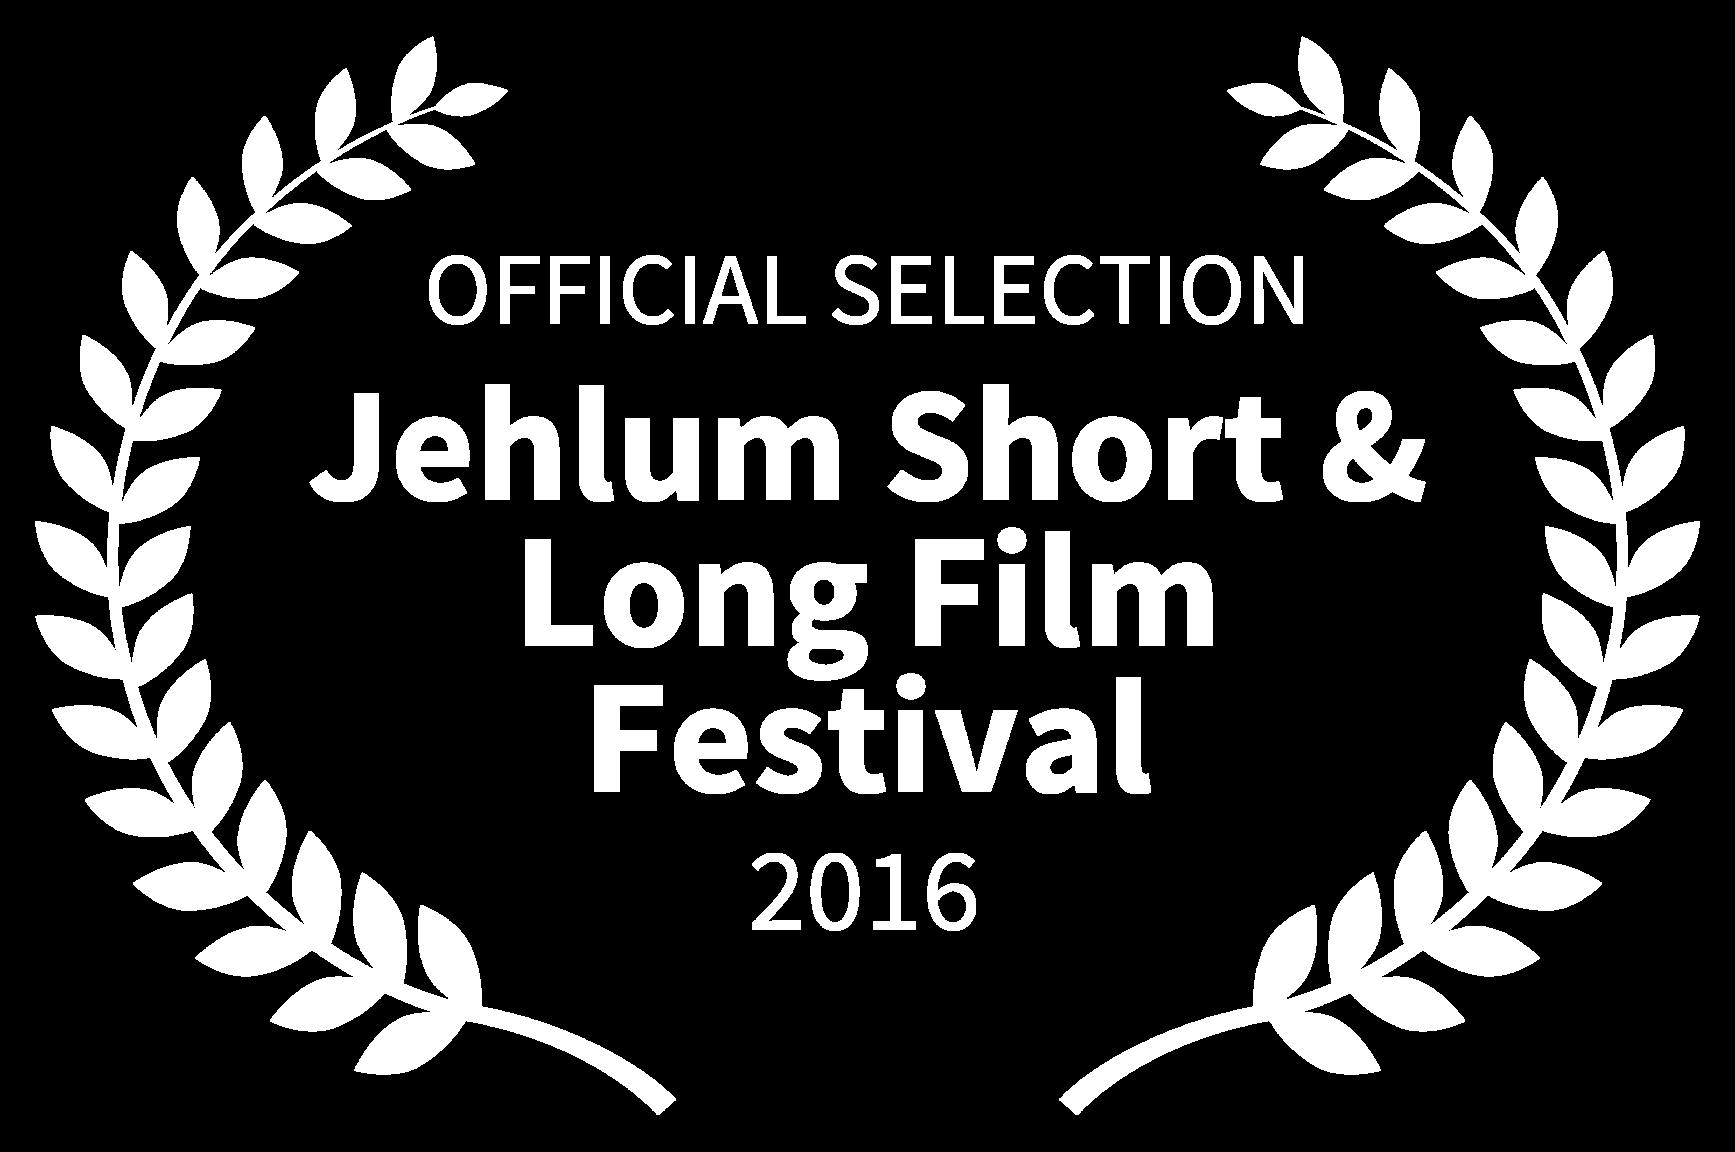 OFFICIAL SELECTION - Jehlum Short  Long Film Festival - 2016